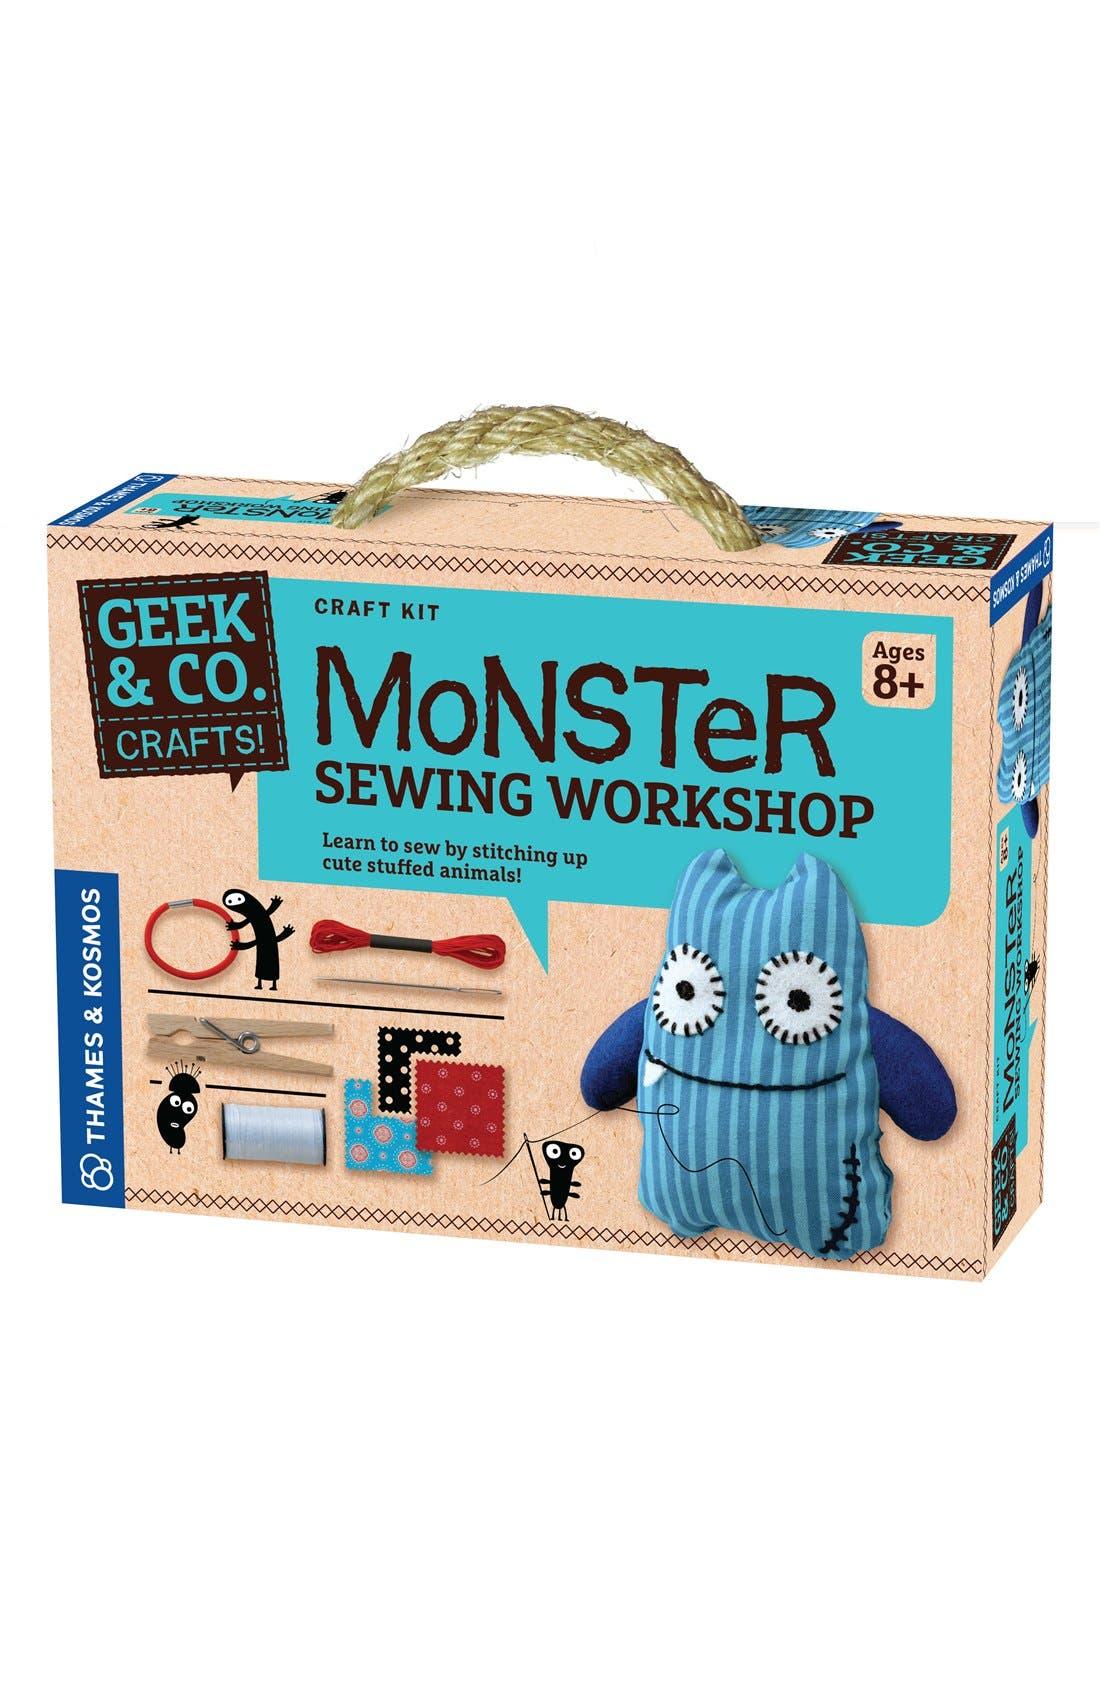 'Monster Sewing Workshop' Sewing Starter Kit,                             Main thumbnail 1, color,                             000